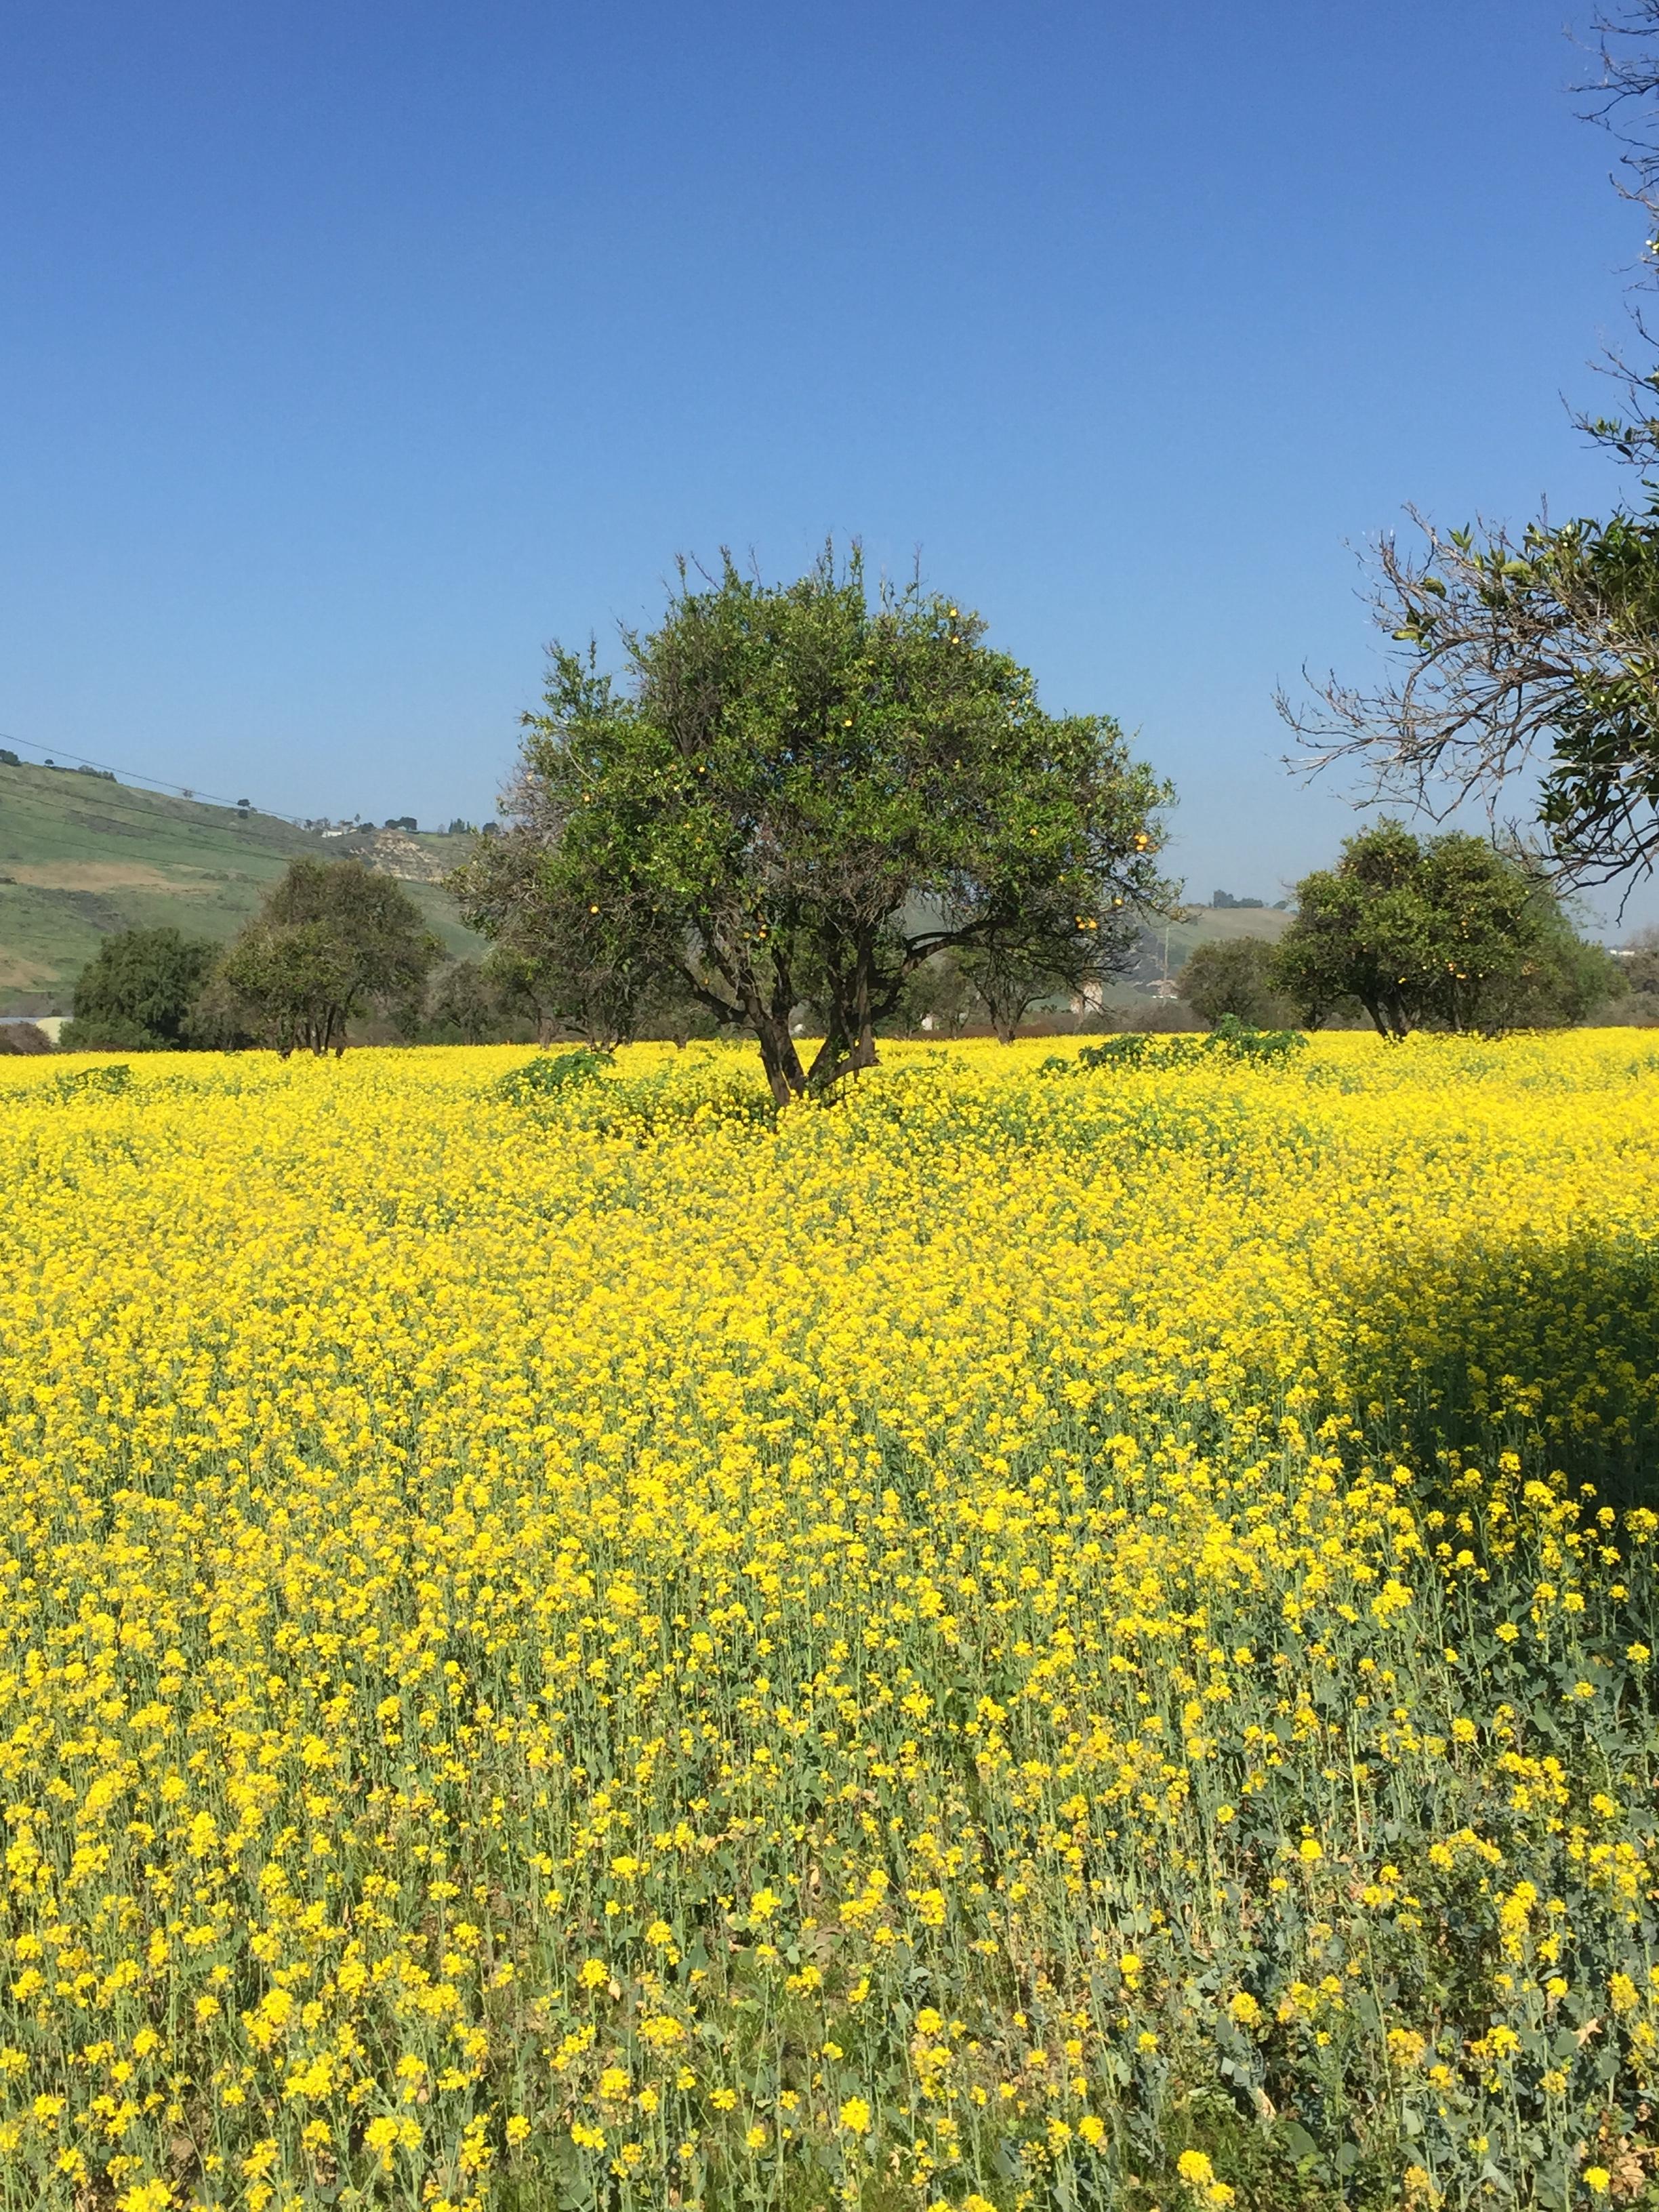 San Juan Capistrano Orange and Mustard Fields